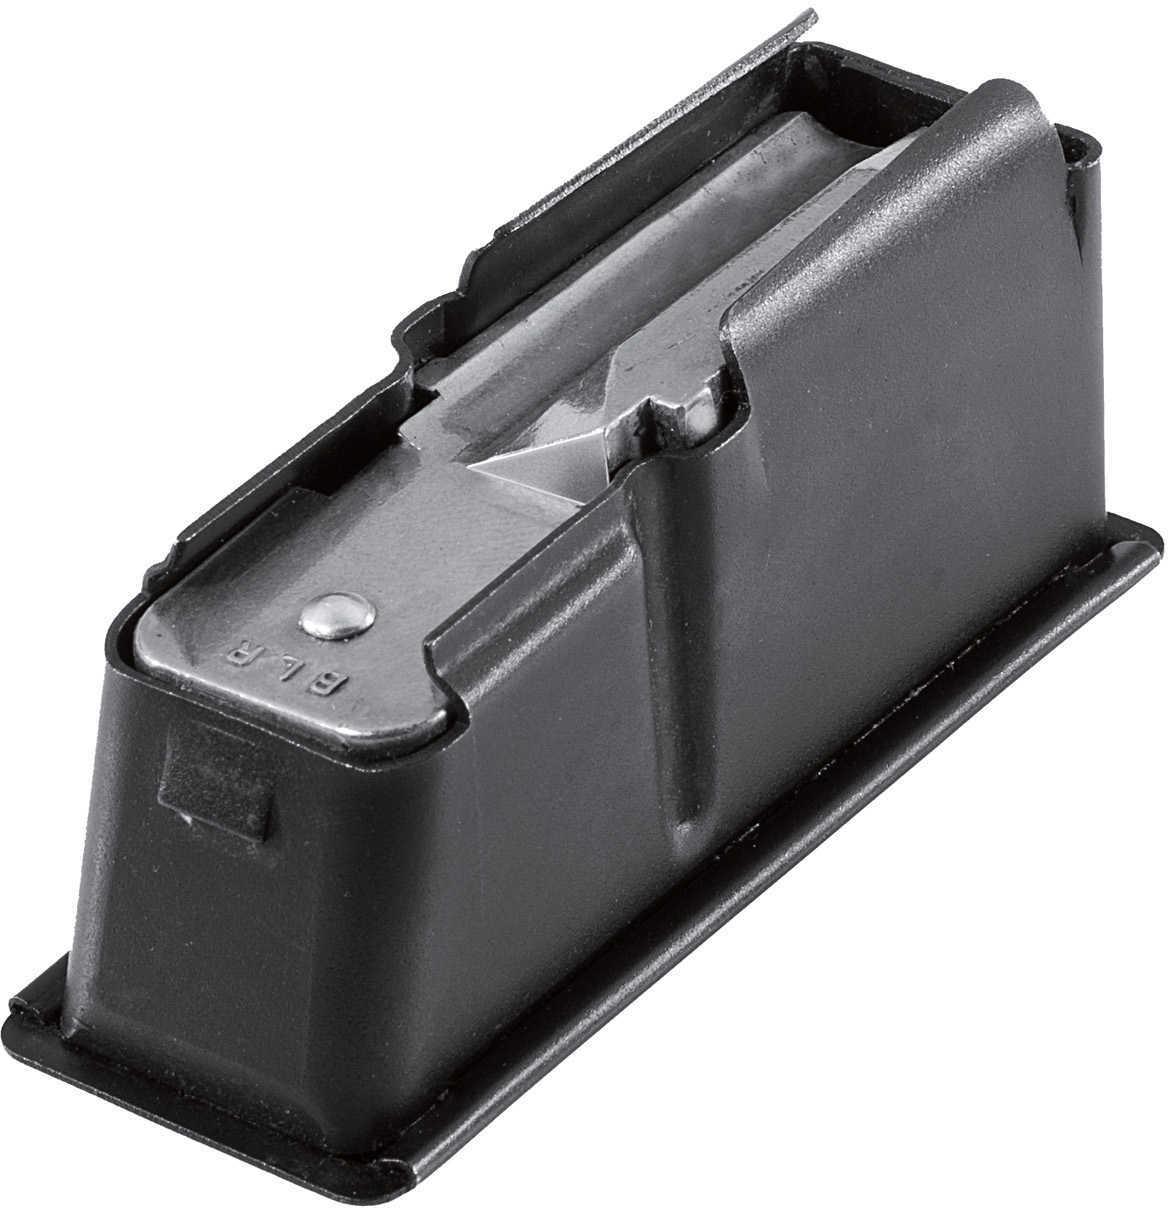 Browning BLR Magazine 450 Marlin, Capacity 3 Md: 112026043